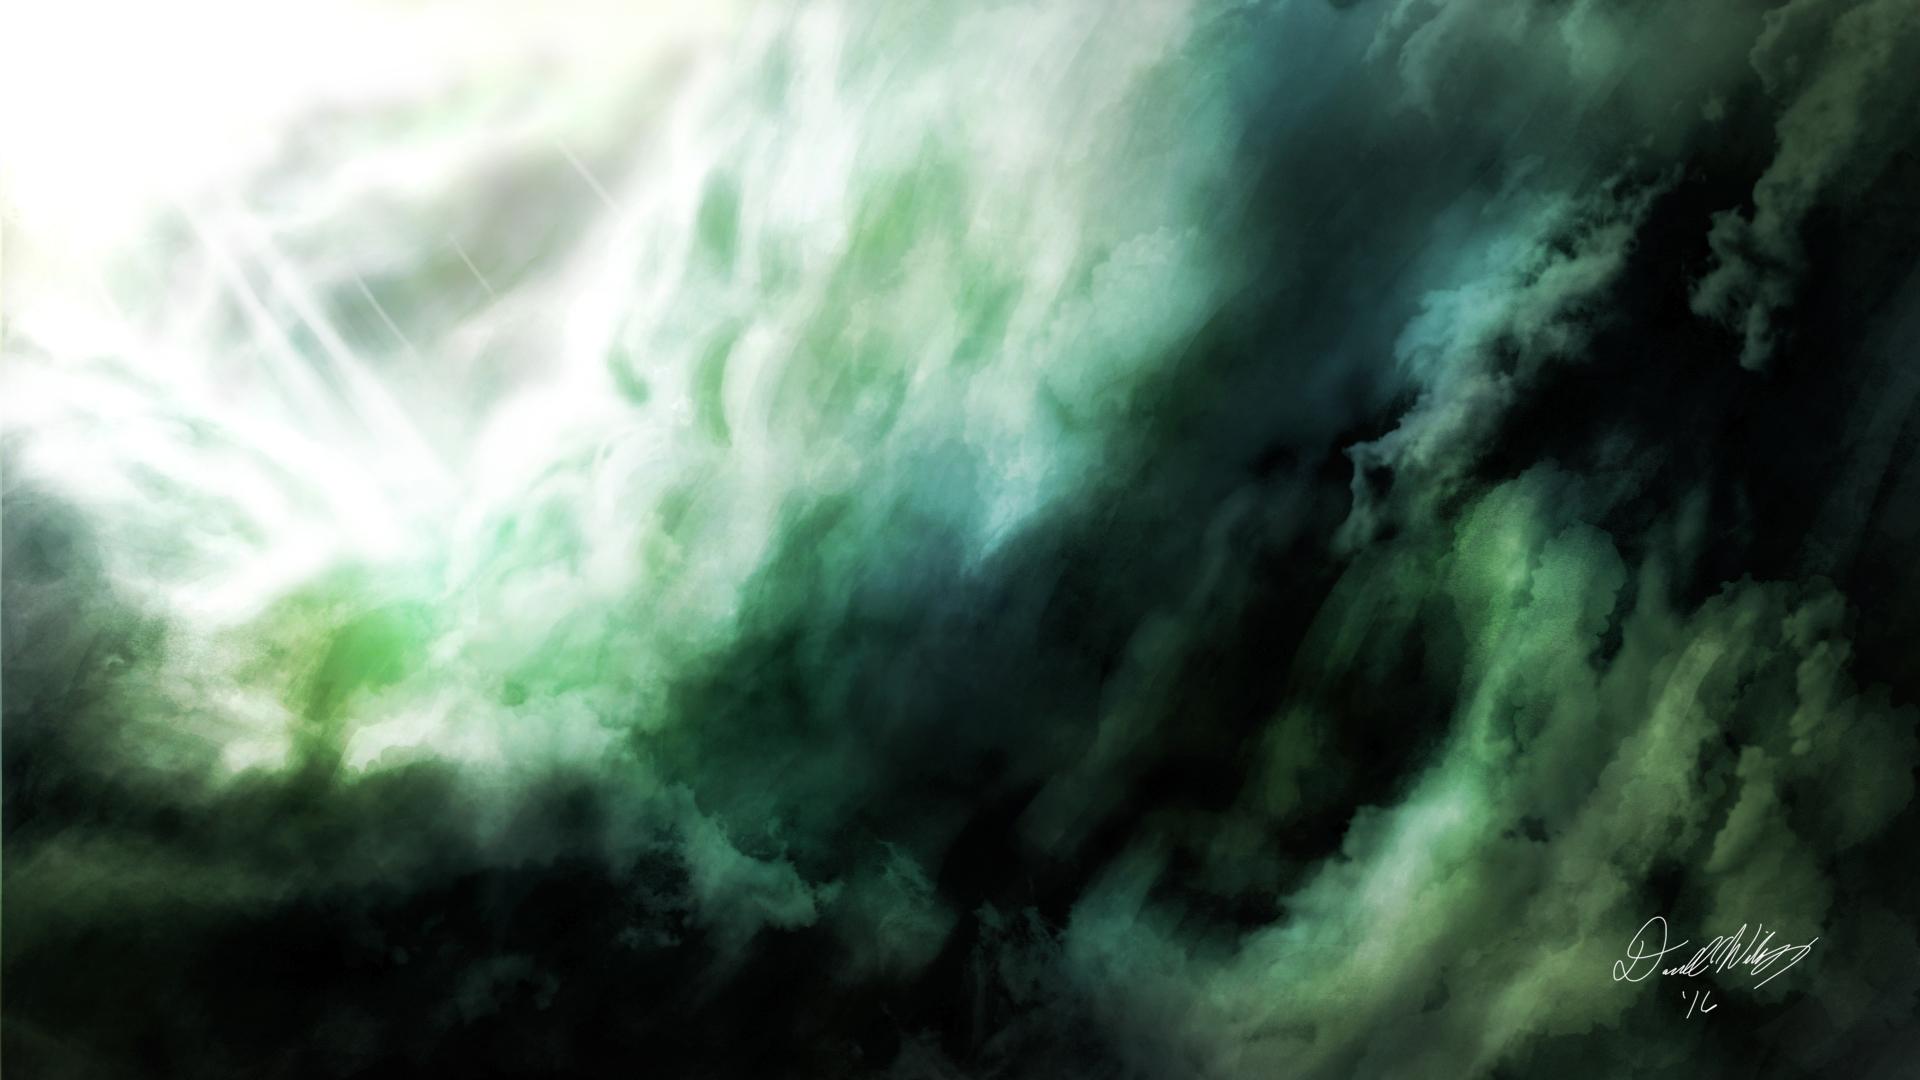 Medit's Sky